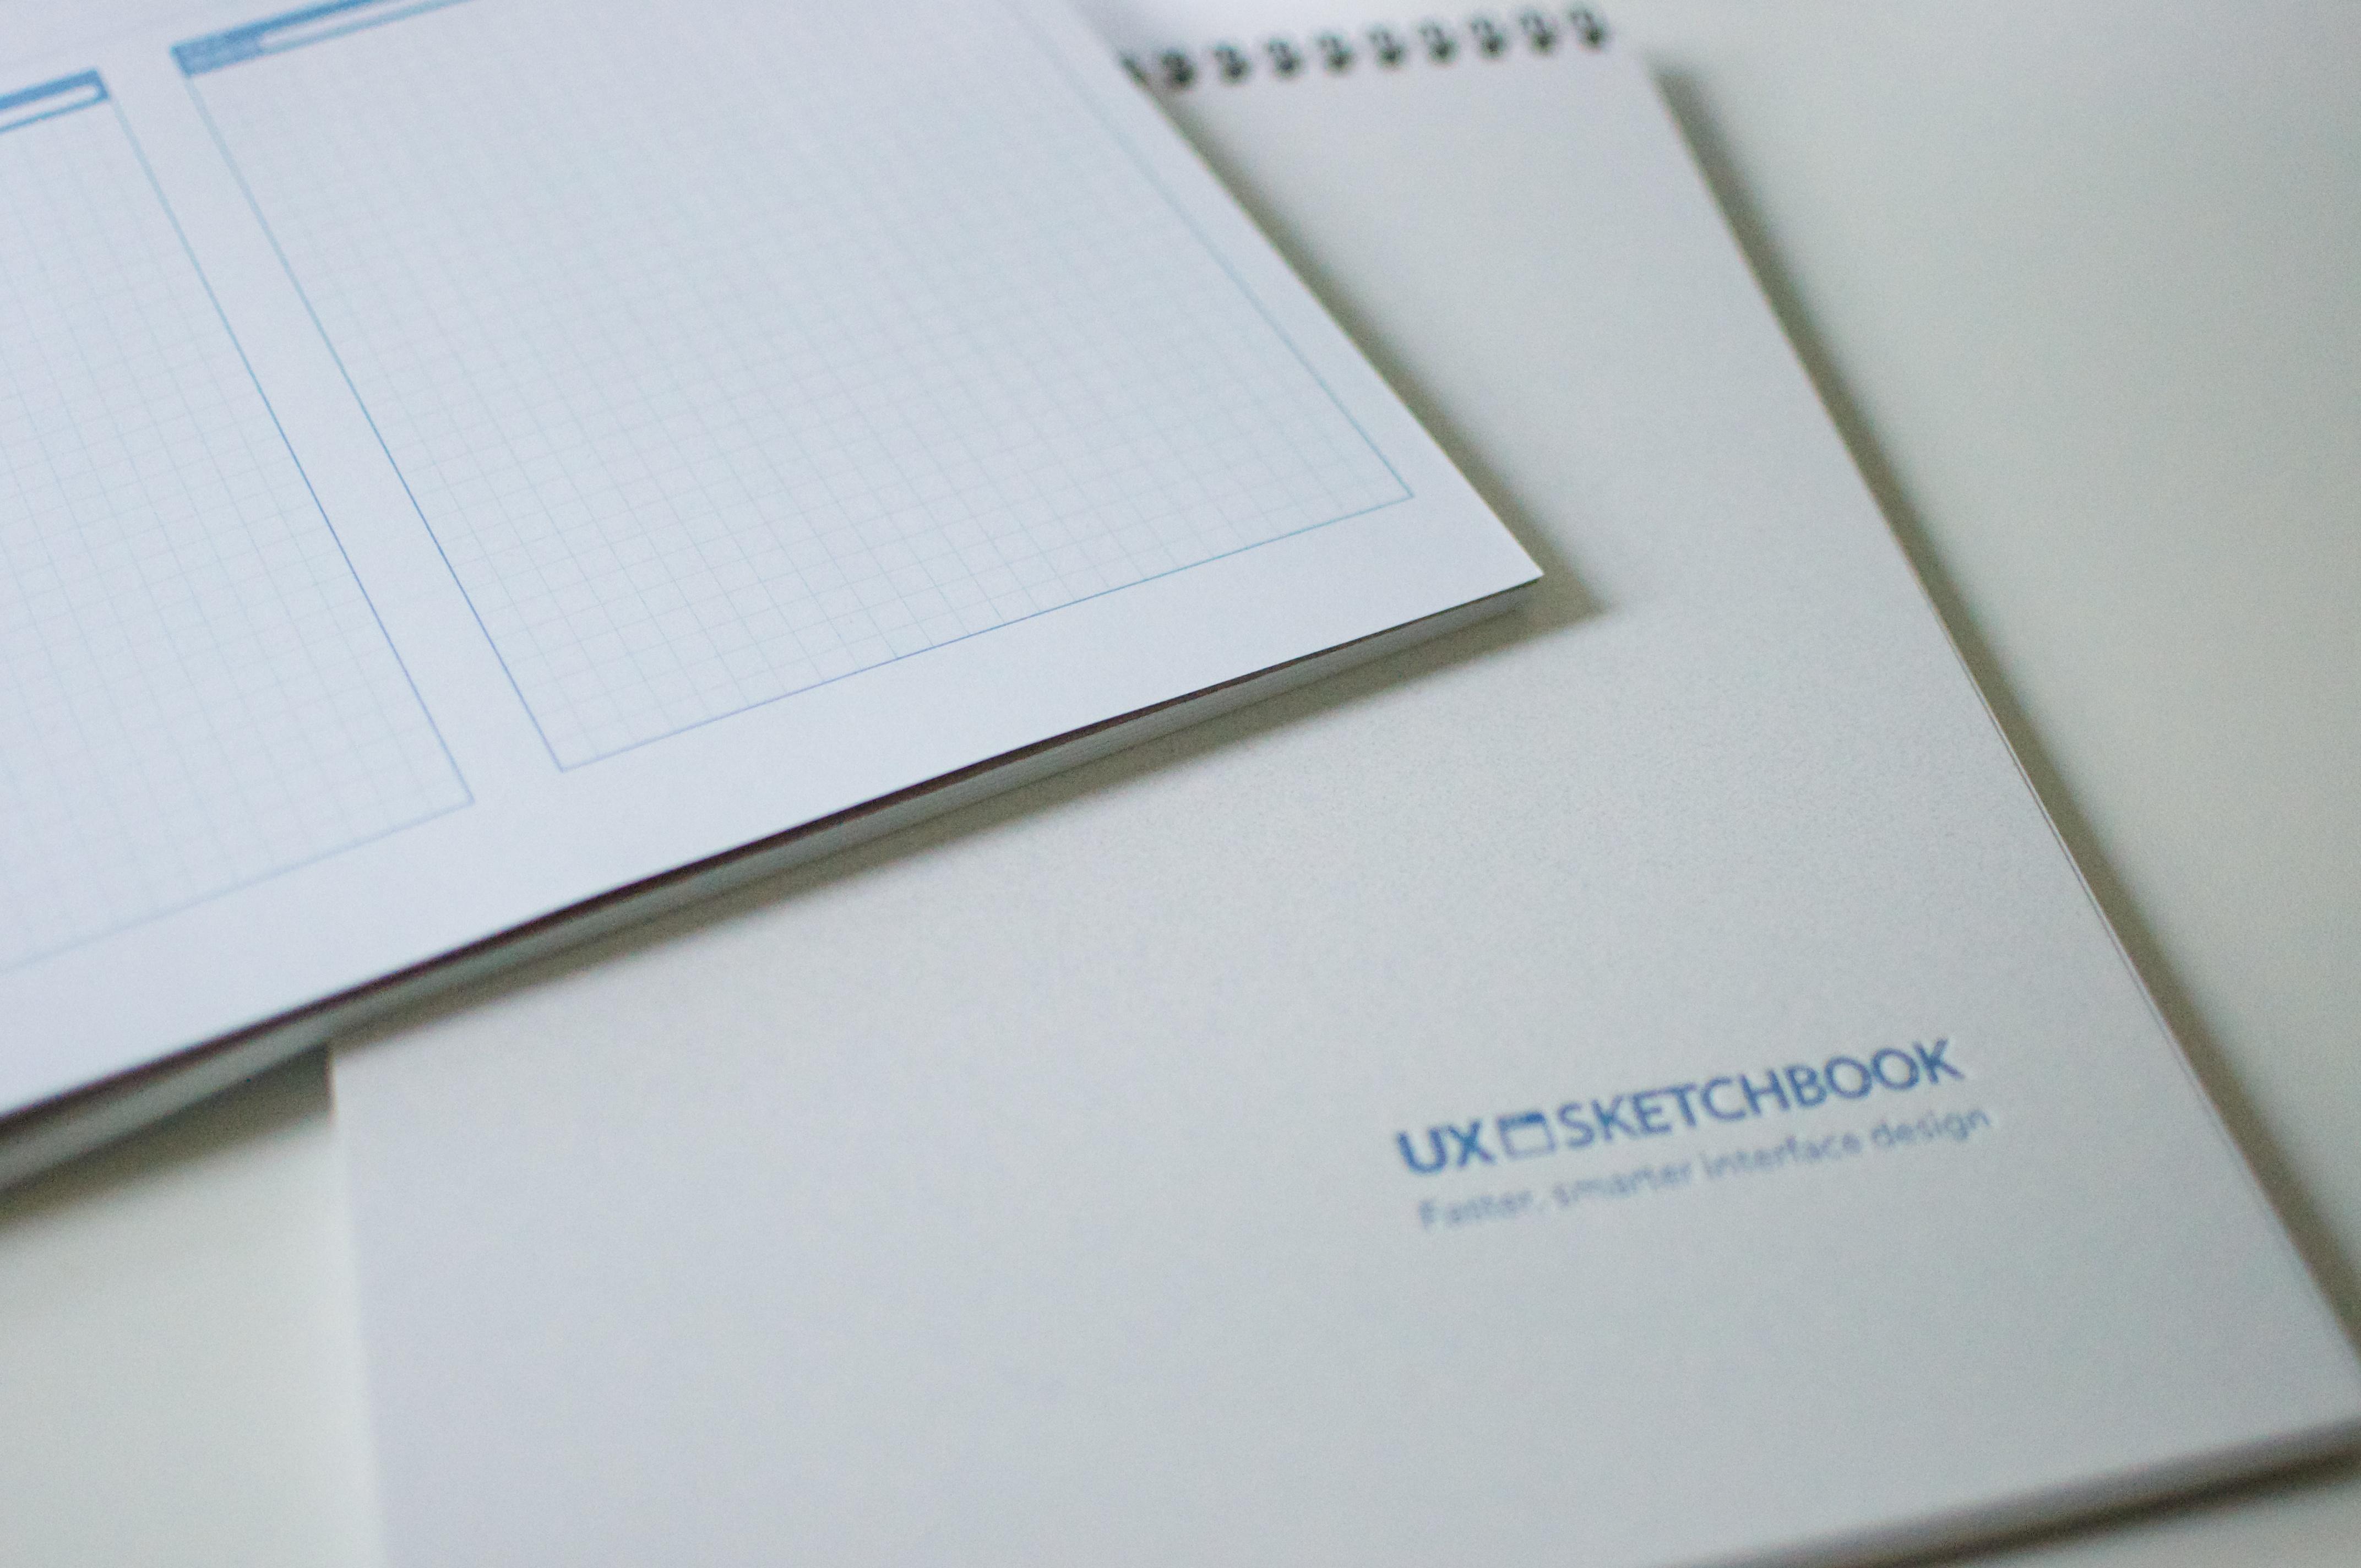 App Sketchbook Creator Releases New Sketchbook for Web Designers